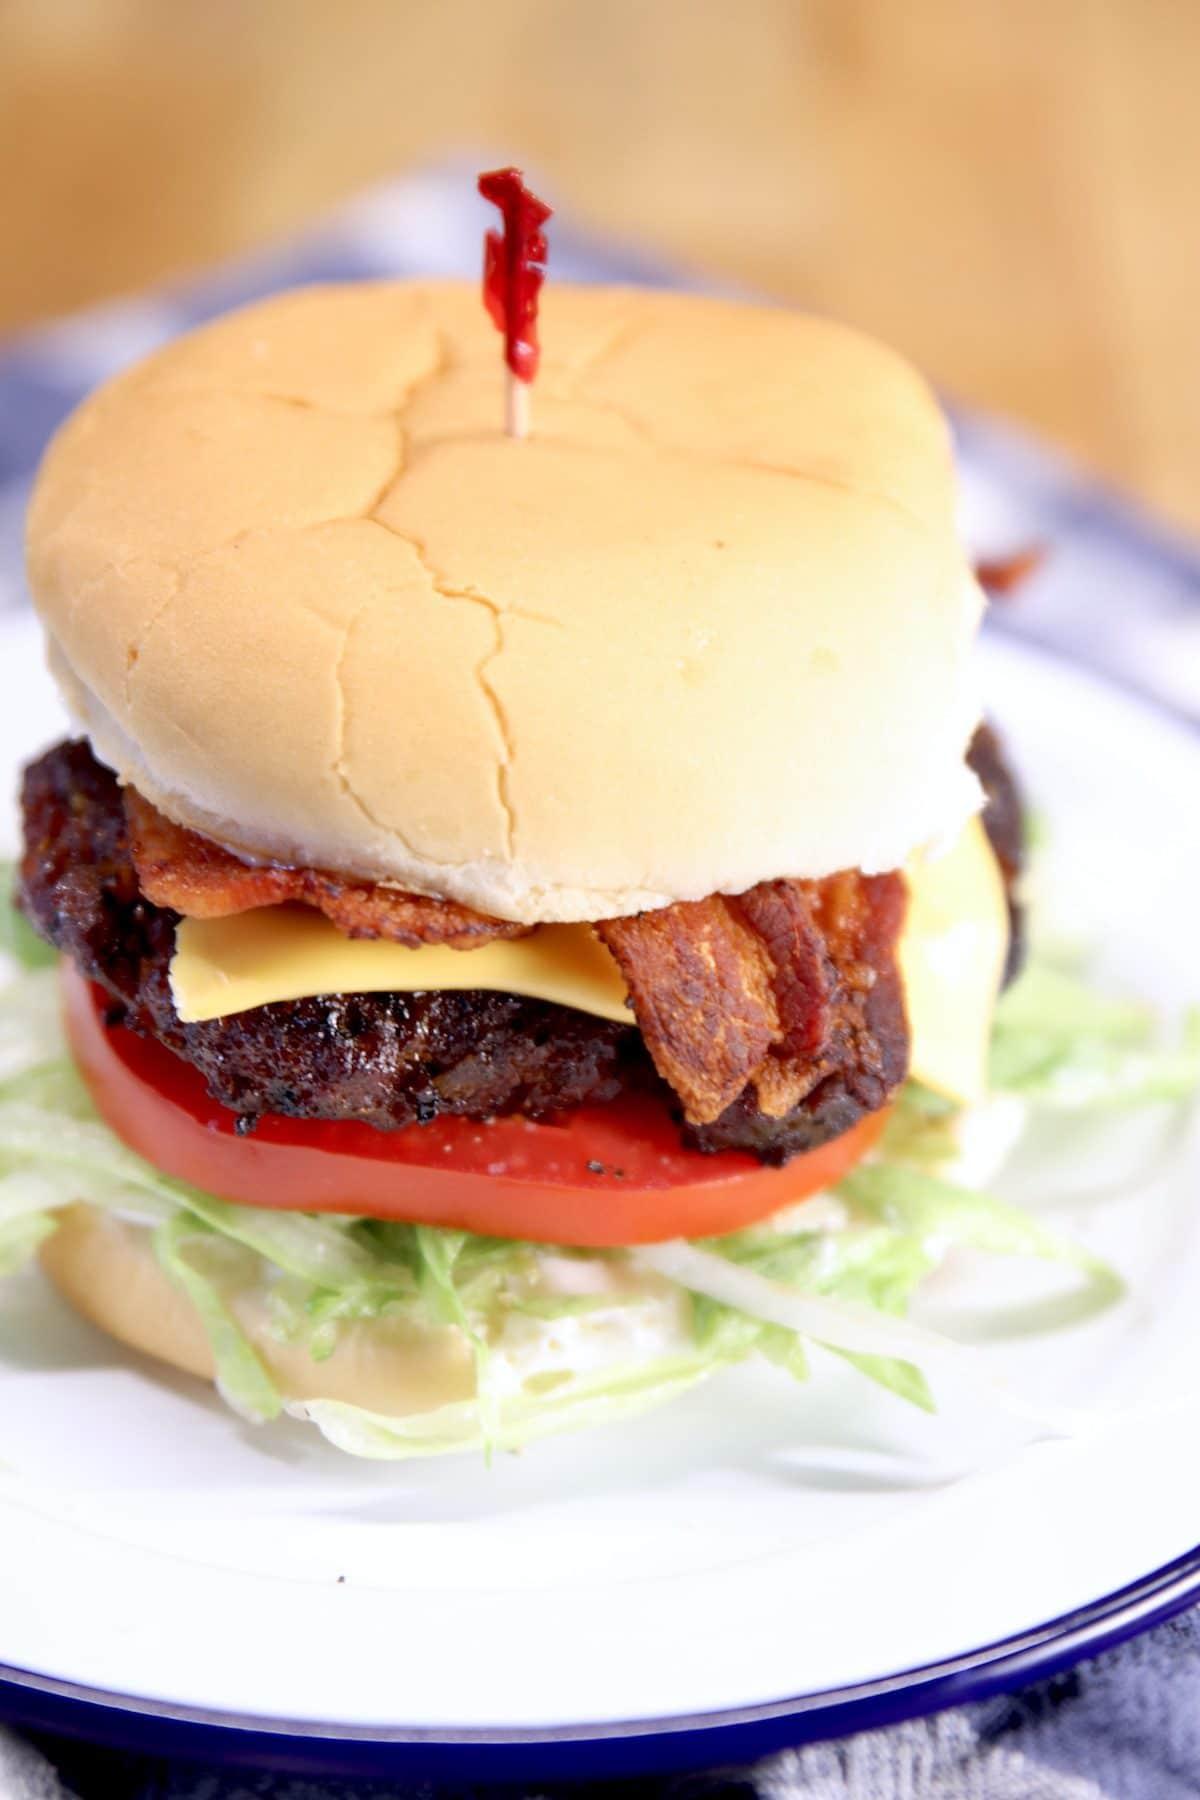 bacon cheeseburger on a plate